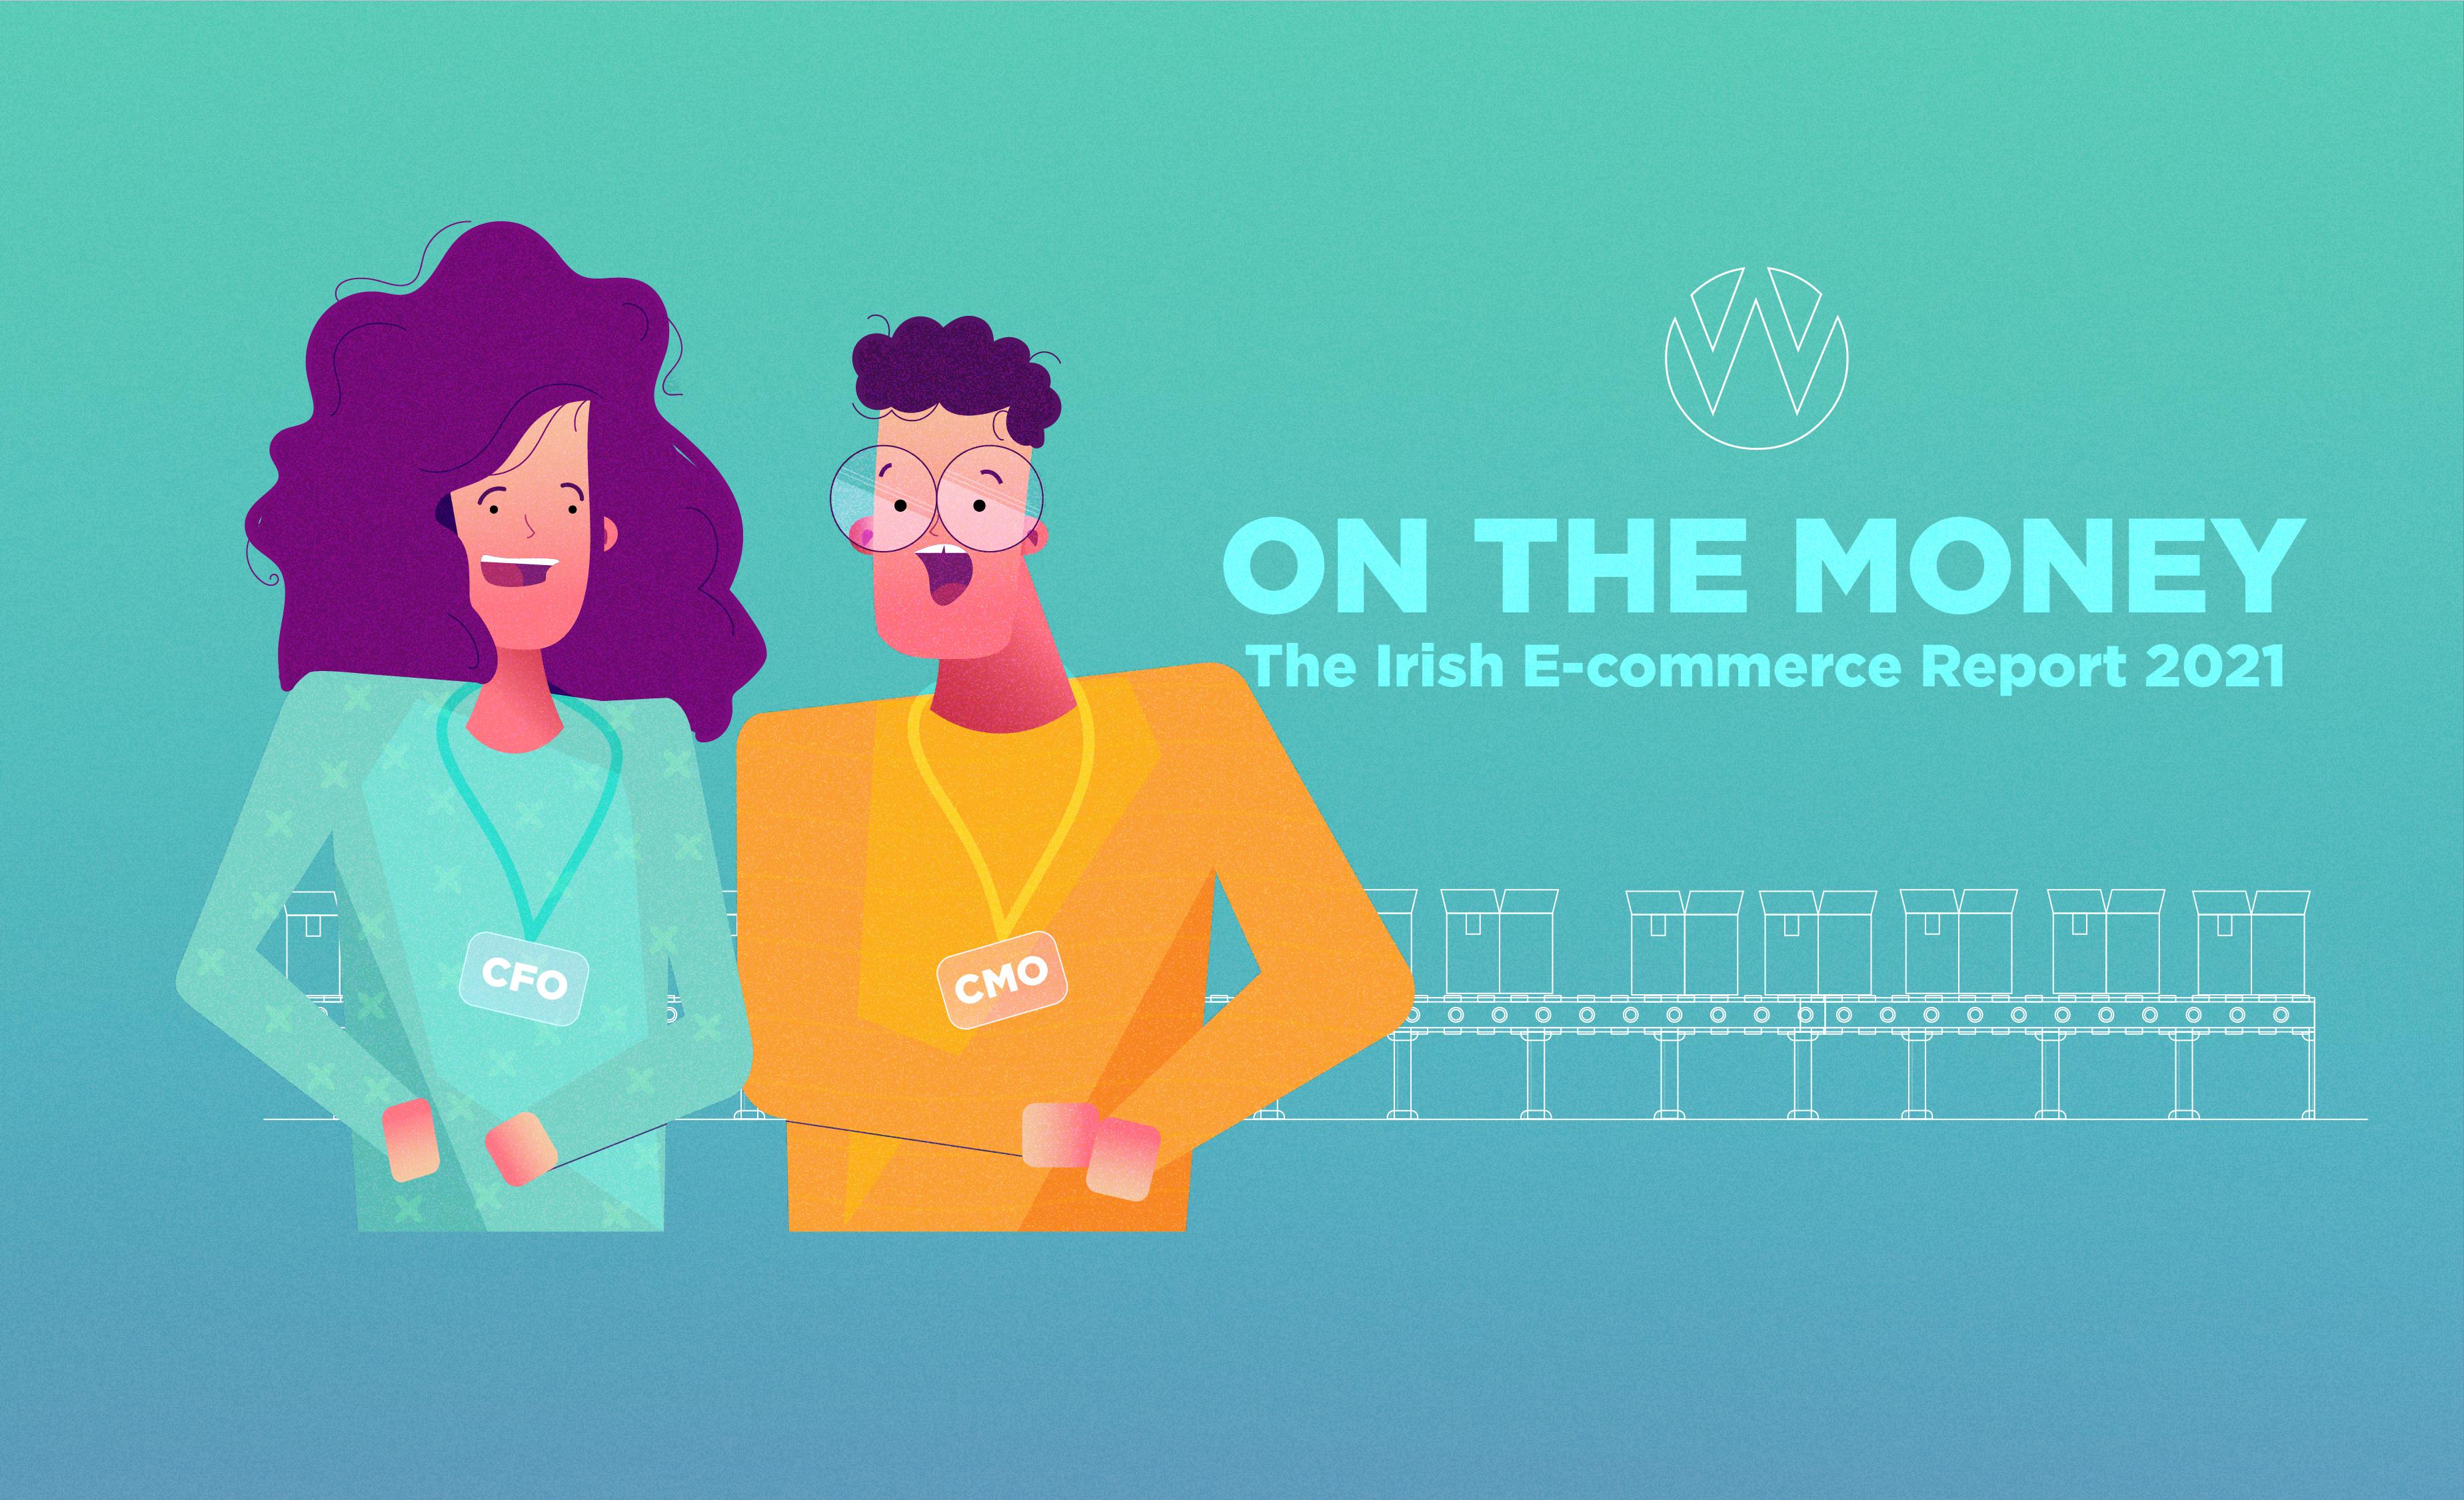 On The Money: The Irish E-commerce Report 2021